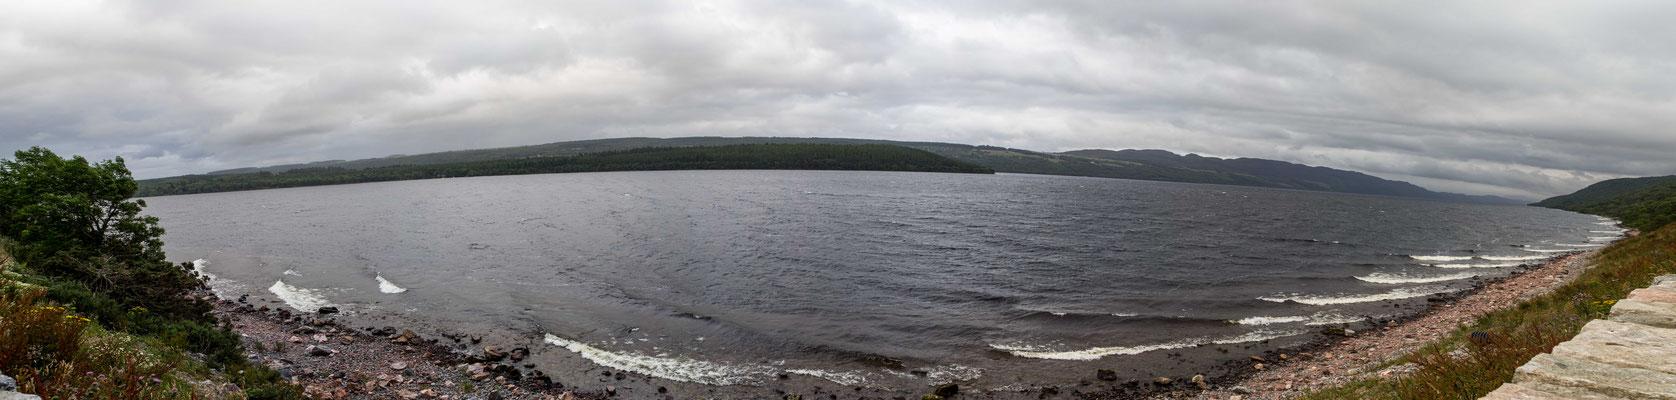 Bild: Loch Ness